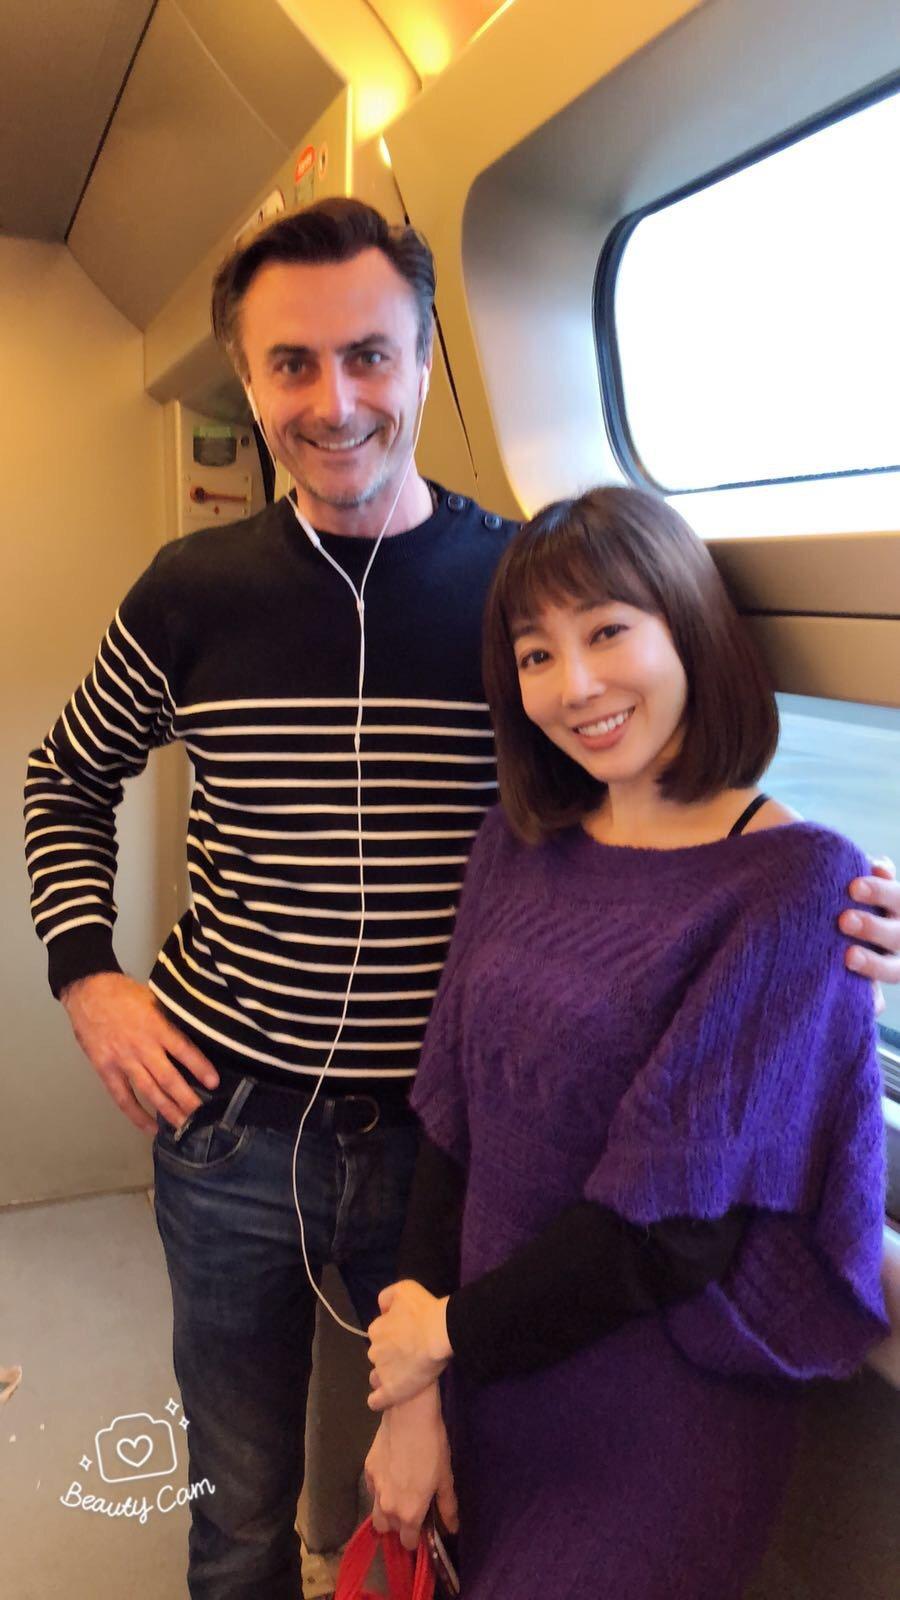 Nana遇見溫柔的法國男生,一起合照。圖/Nana提供